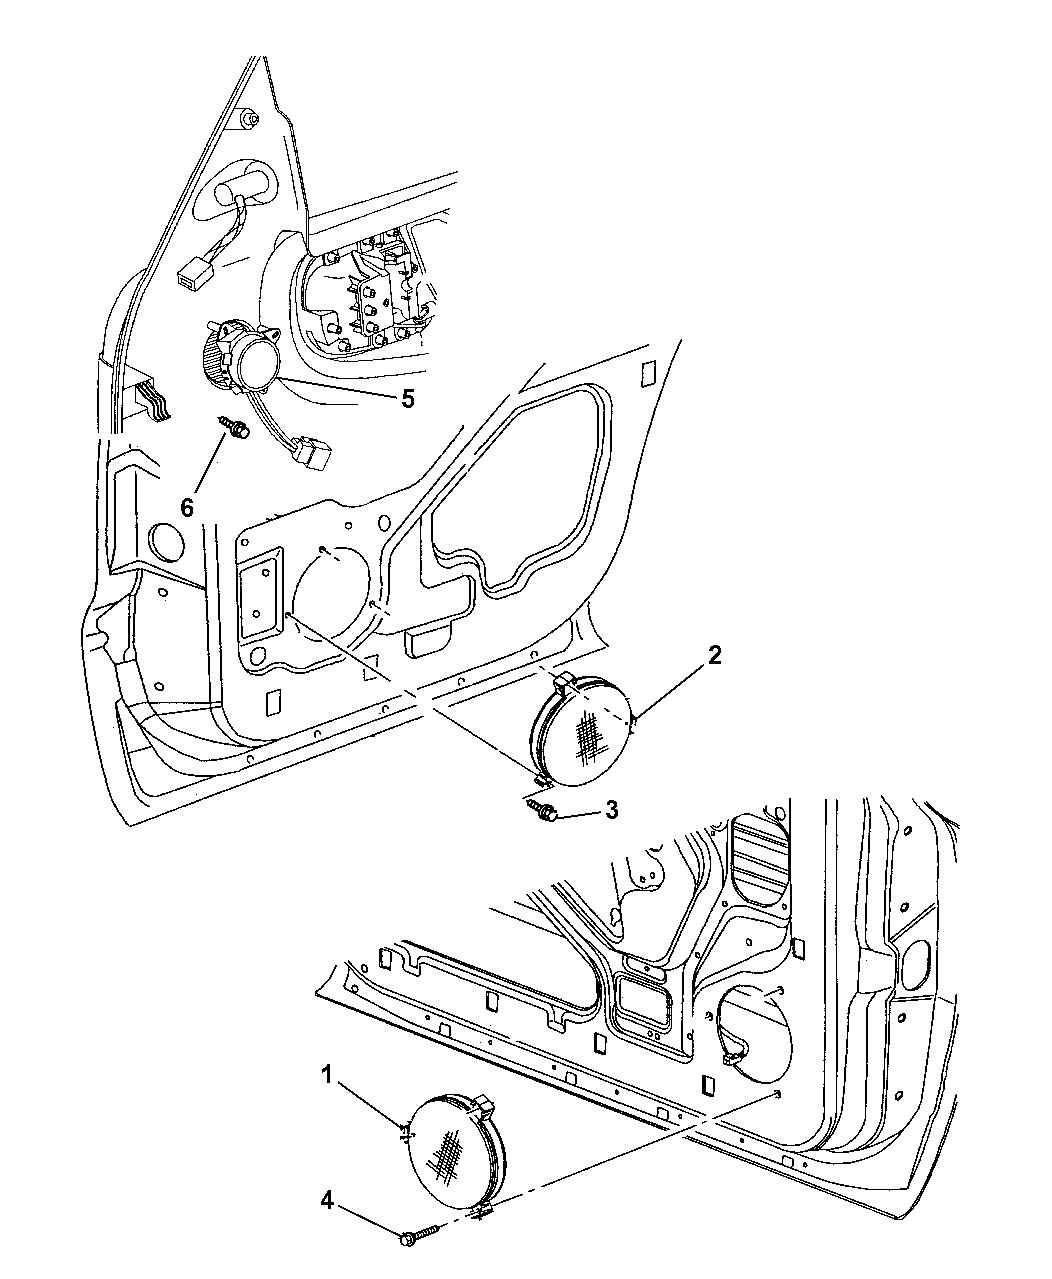 1999 Dodge Durango Speakers